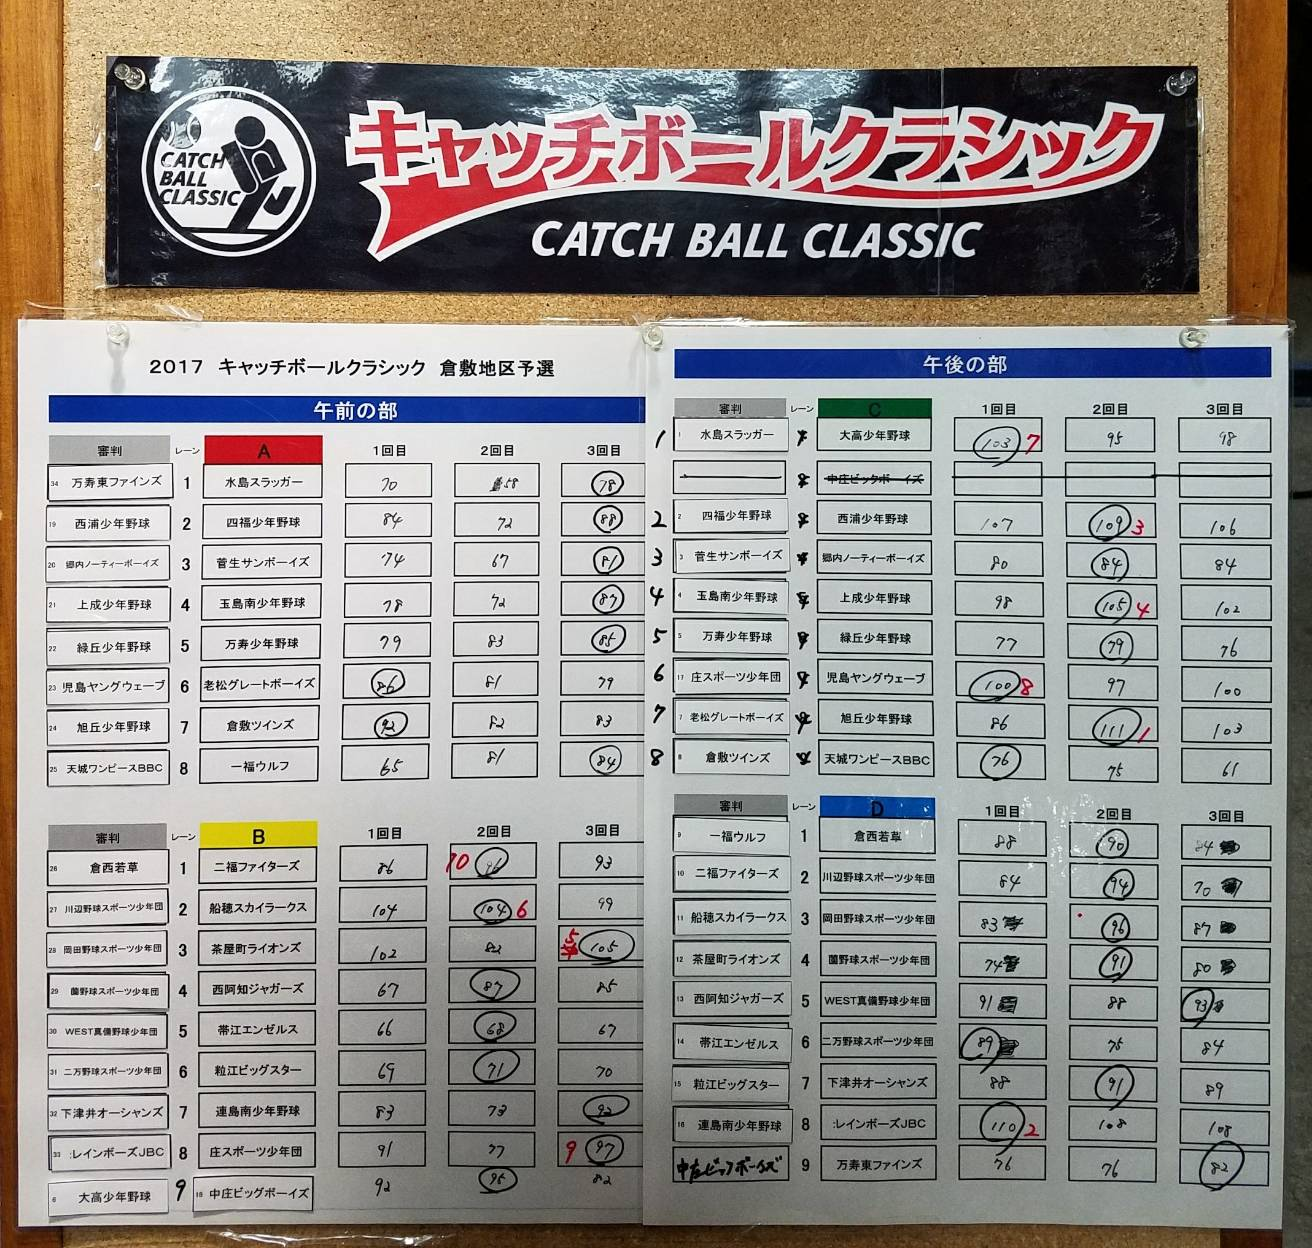 http://www.playsports.jp/news/images/6119631044916.jpg